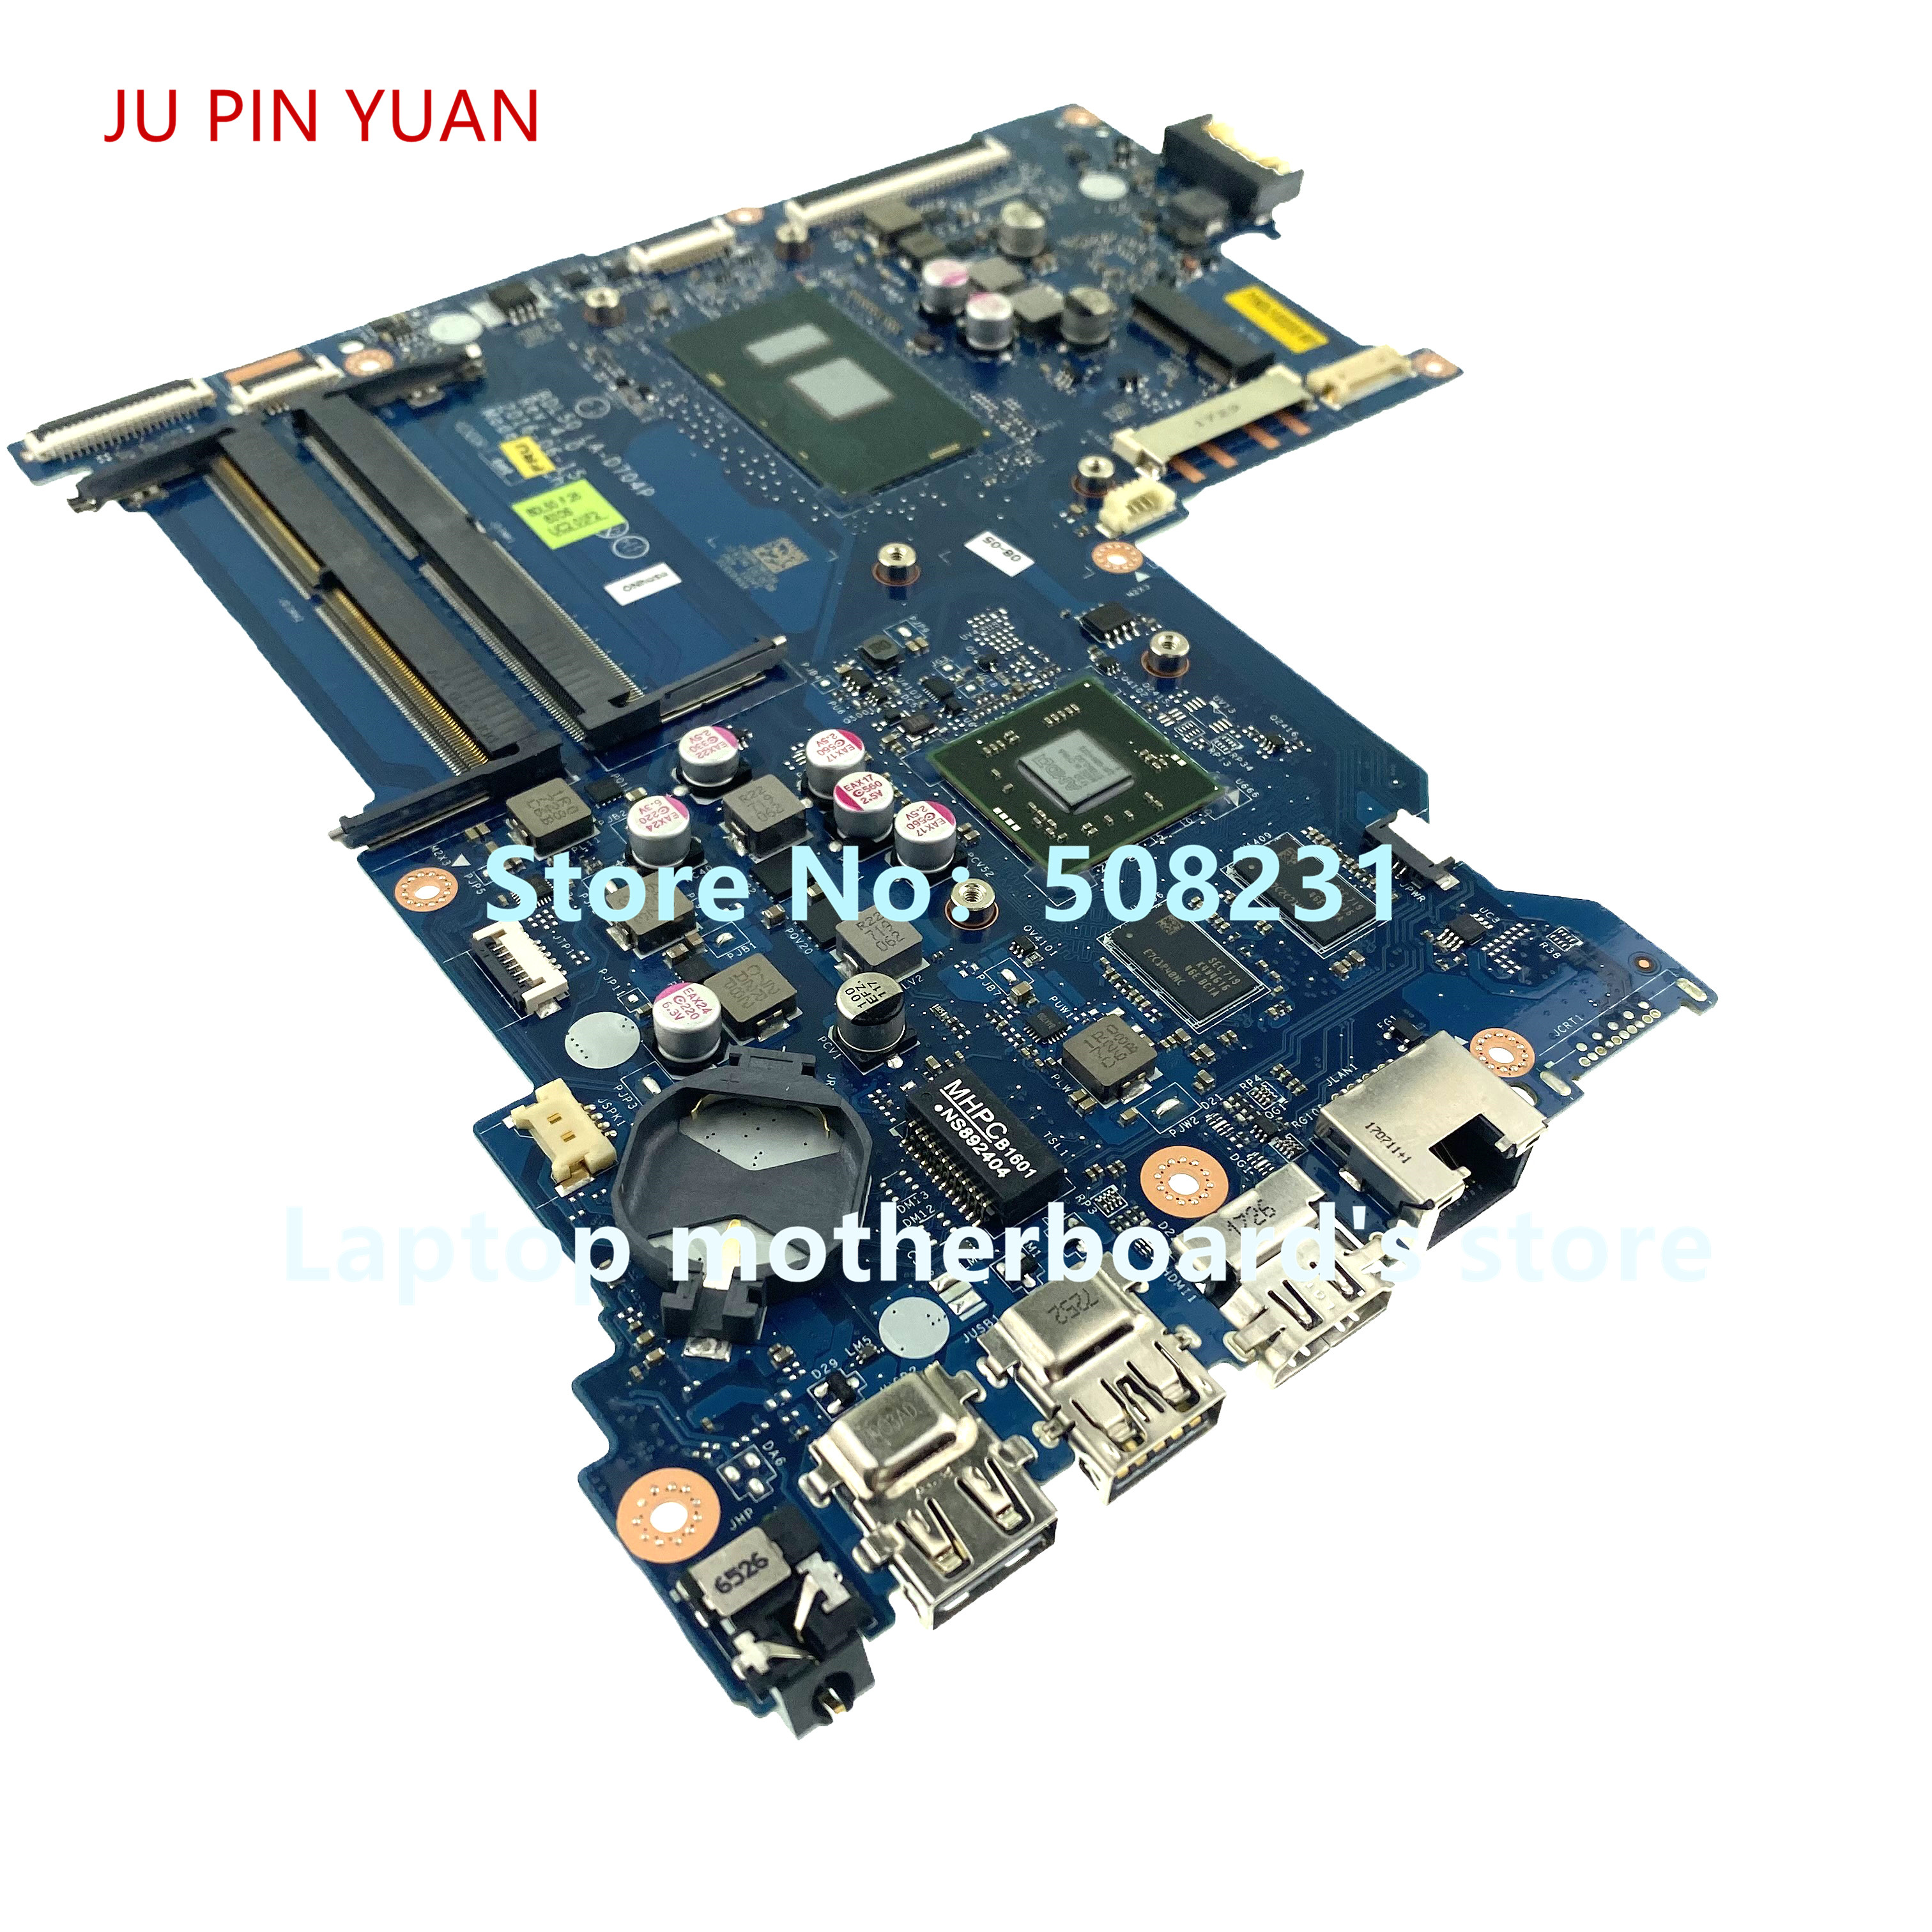 JU PIN YUAN BDL50 LA-D704P For HP 15-AY 15-be Laptop Motherboard  R7M1-70 2GB I7-6500U  858868-601 858868-501 858868-001